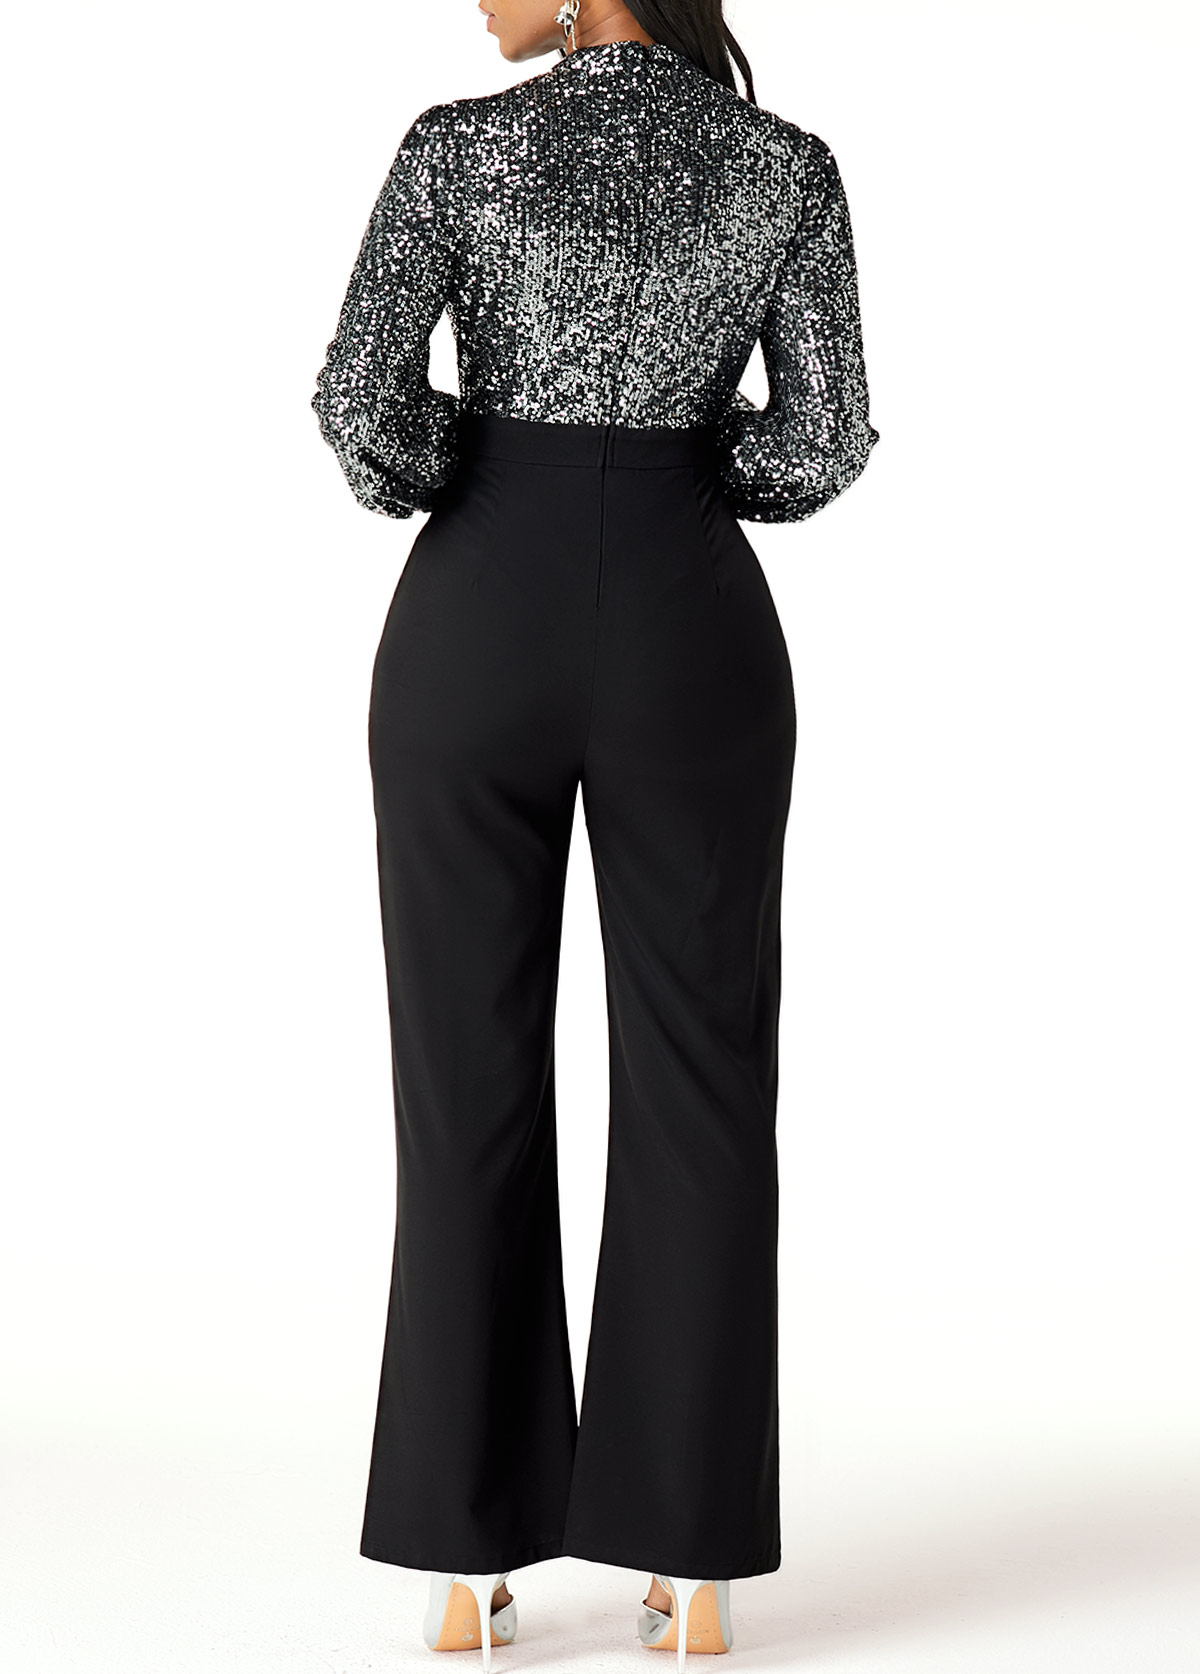 Cutout Front High Waist Sequin Embellished Jumpsuit